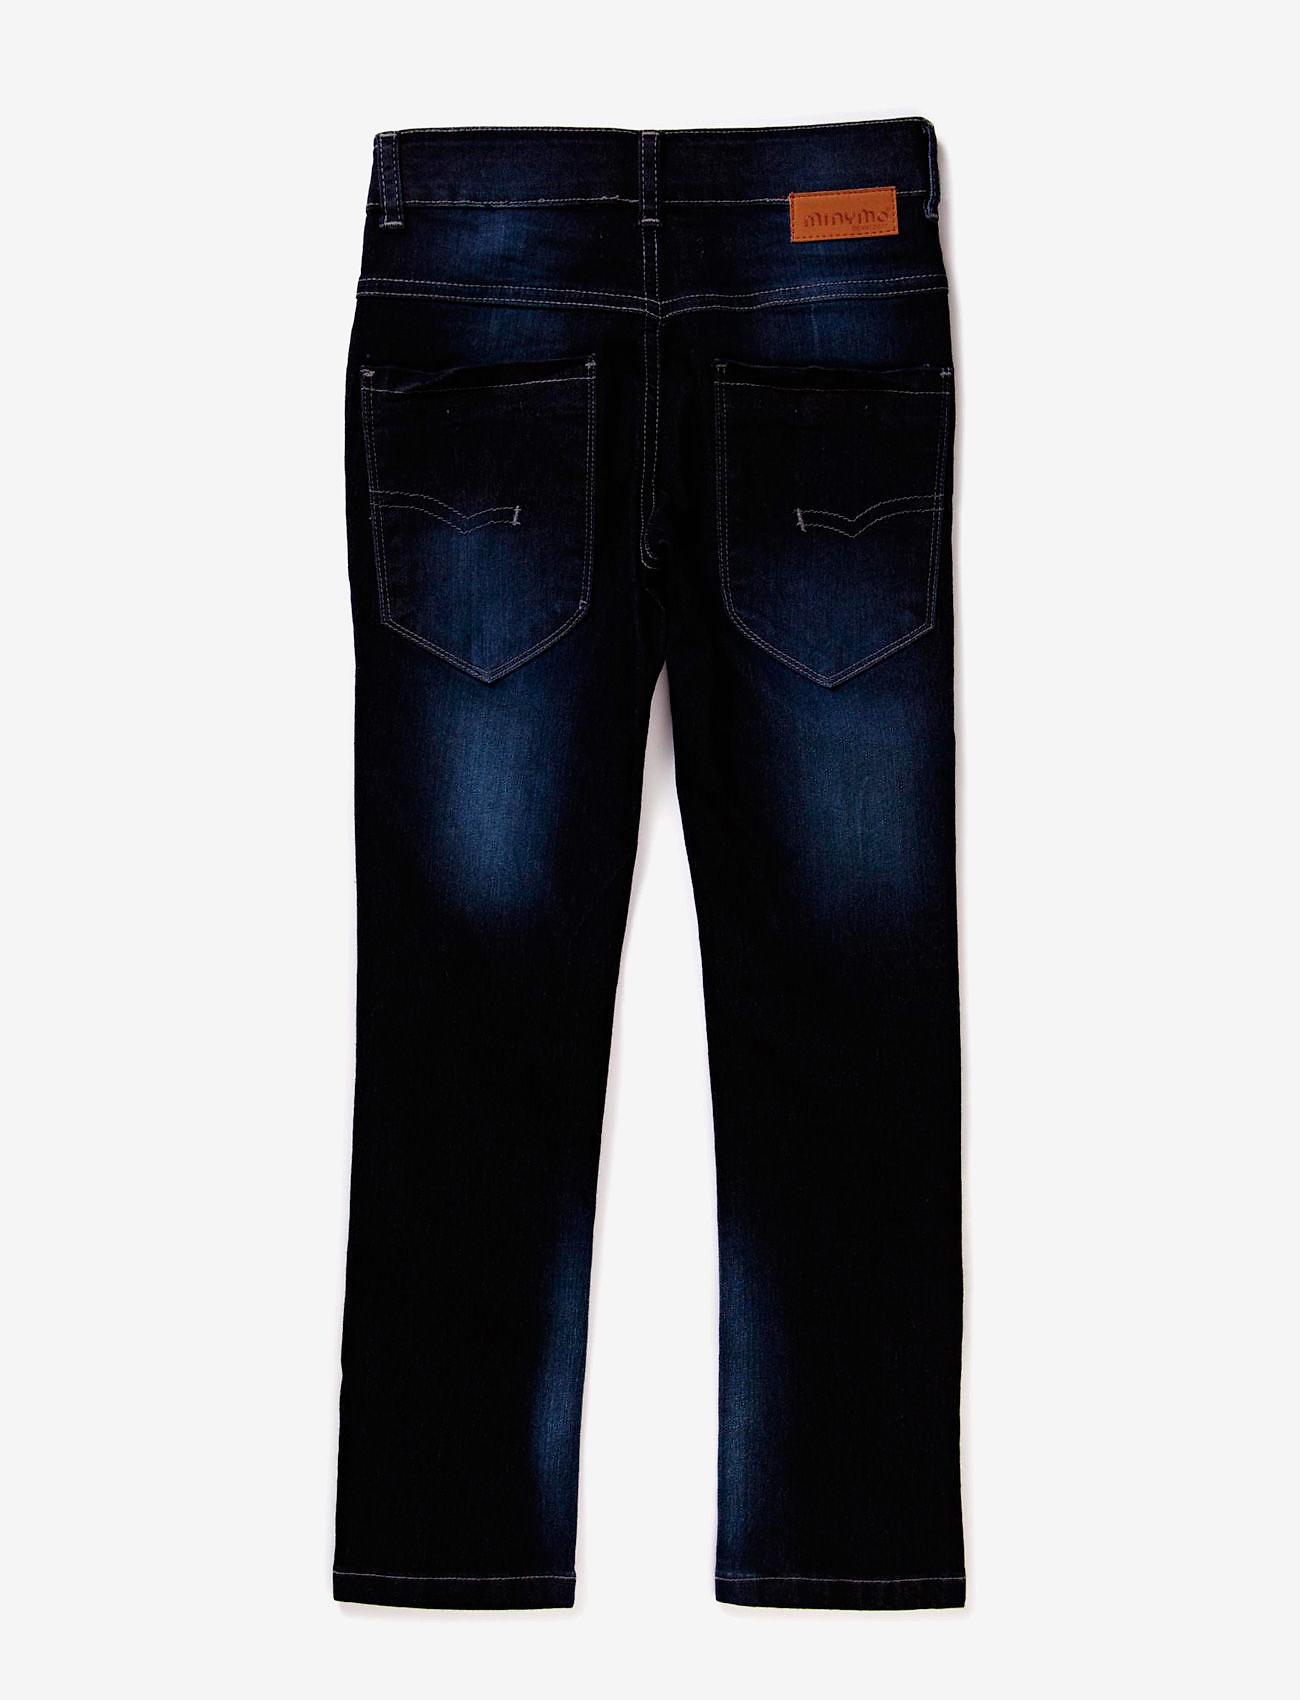 Minymo - Jeans boy Malvin - Slim fit - dżinsy - dark blue denim - 1